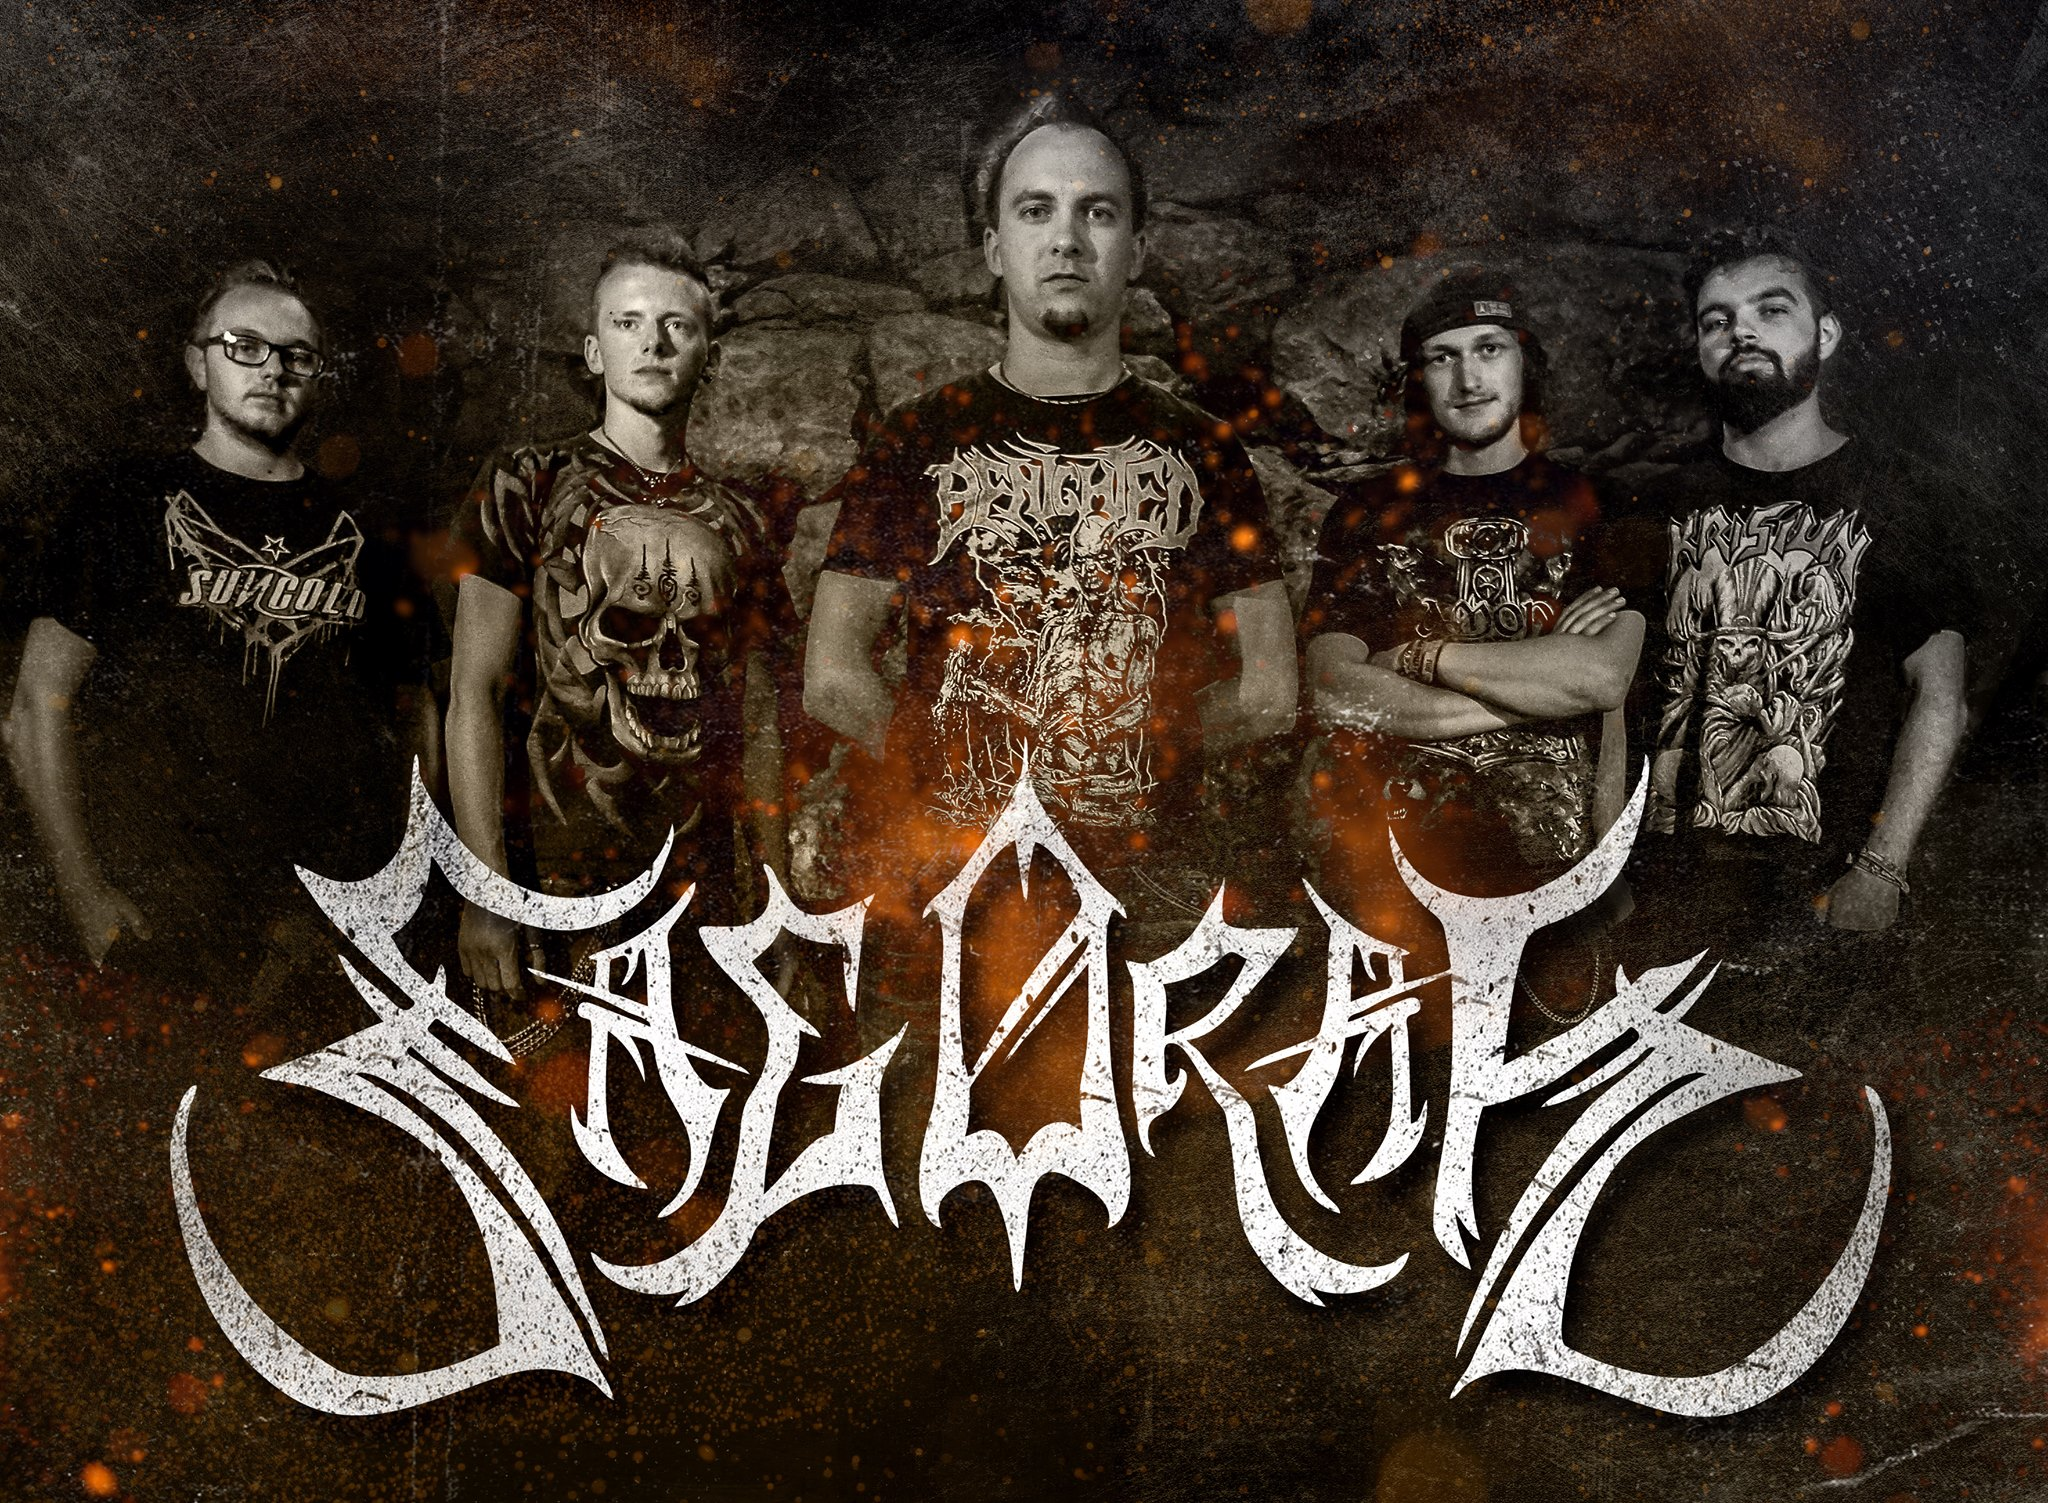 Sagorah – Conosciamo questa nuova realtà nel Panorama Metal